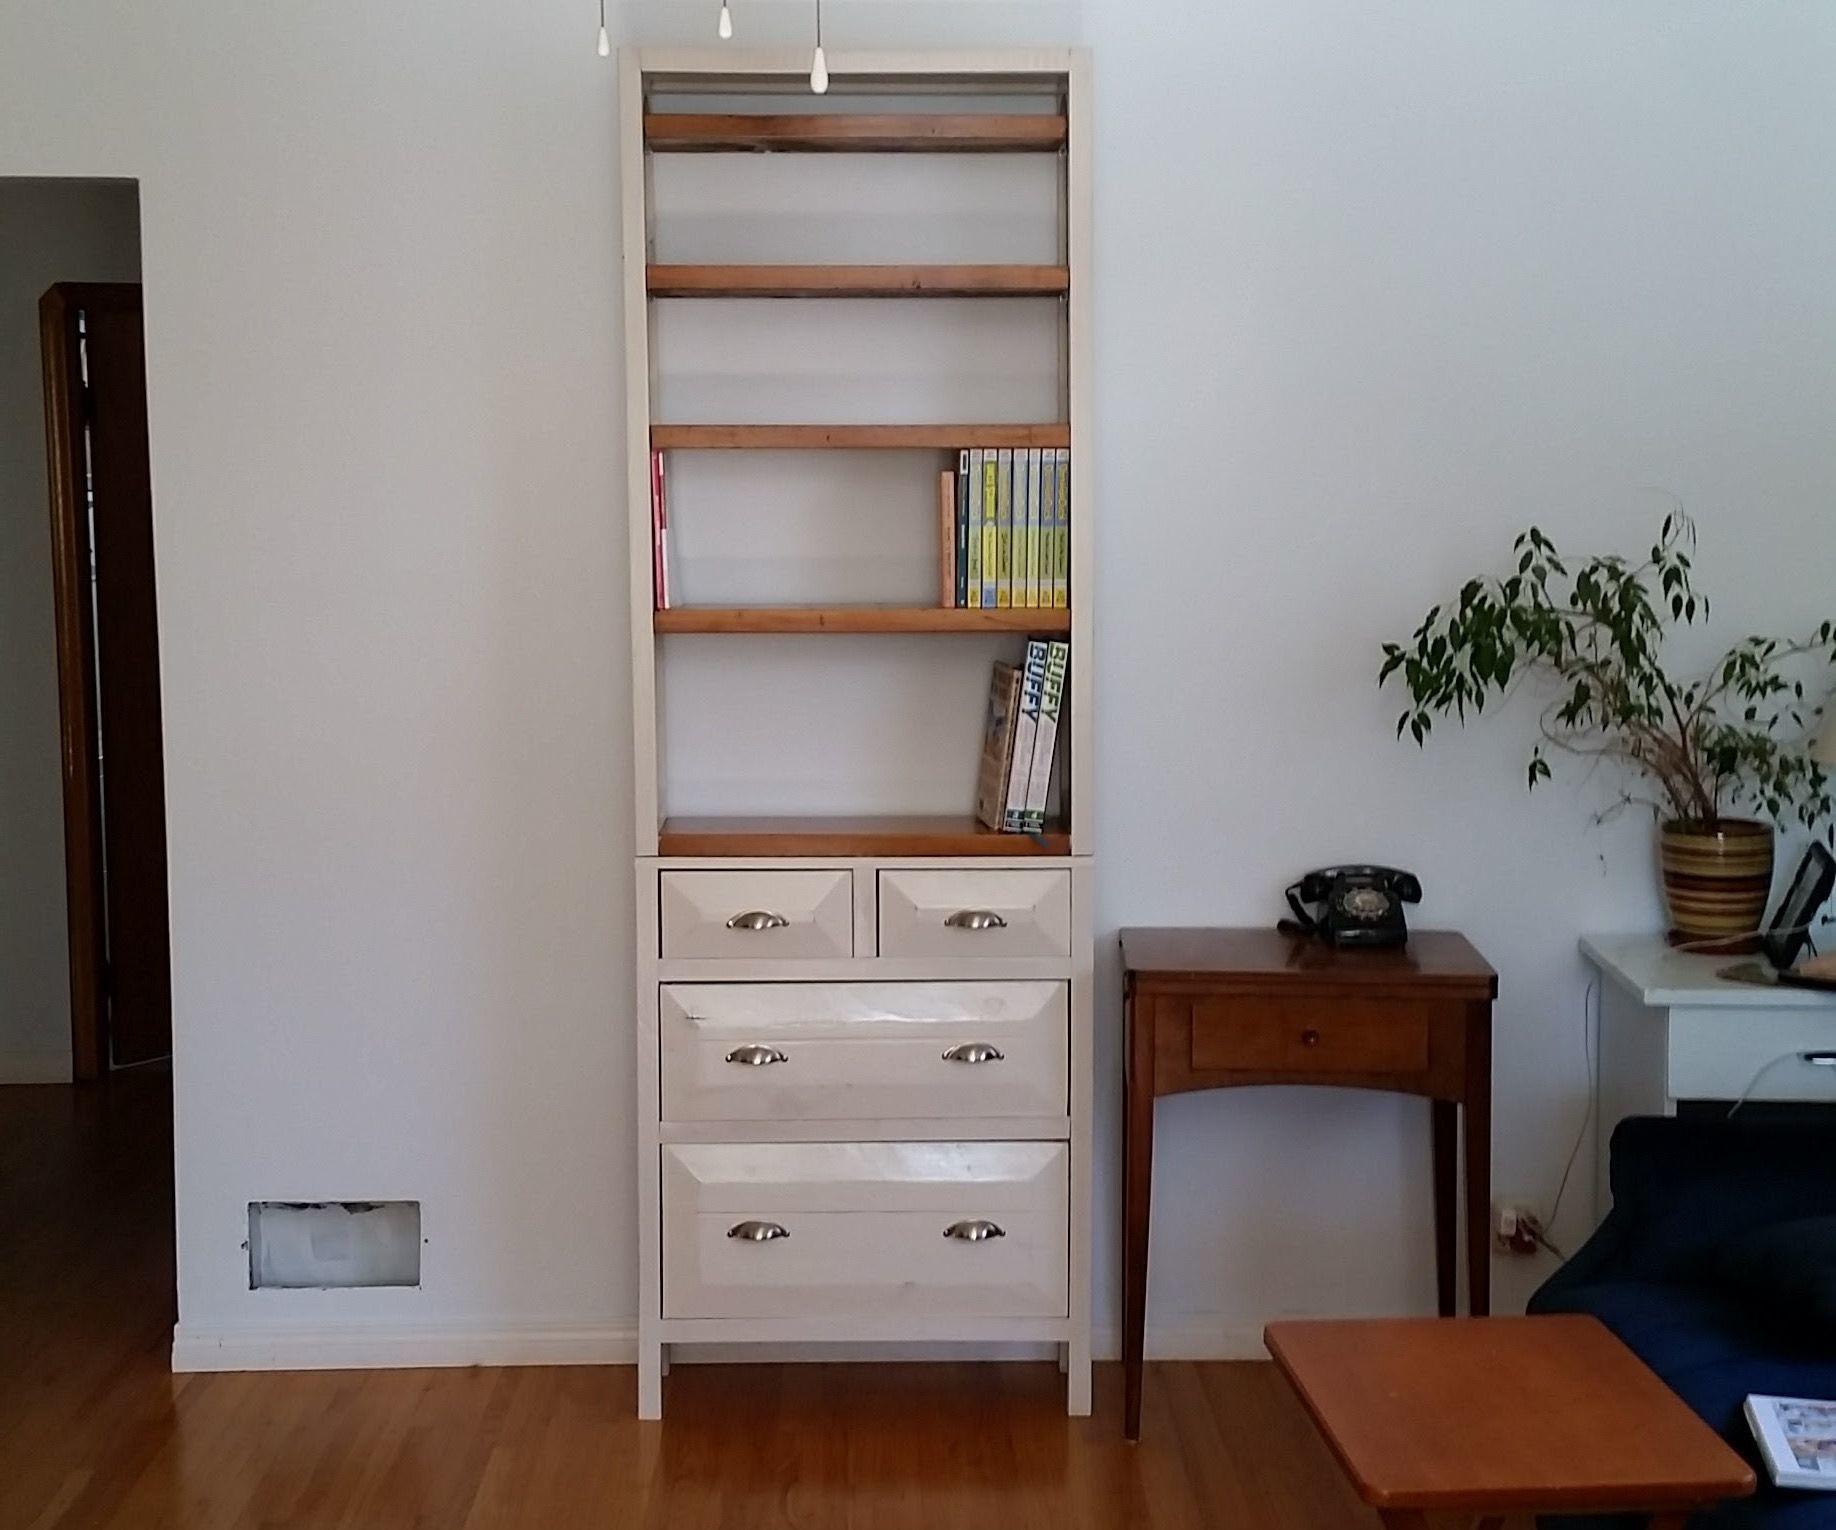 Rustic Tall Wood Bookshelf (with Blunders)